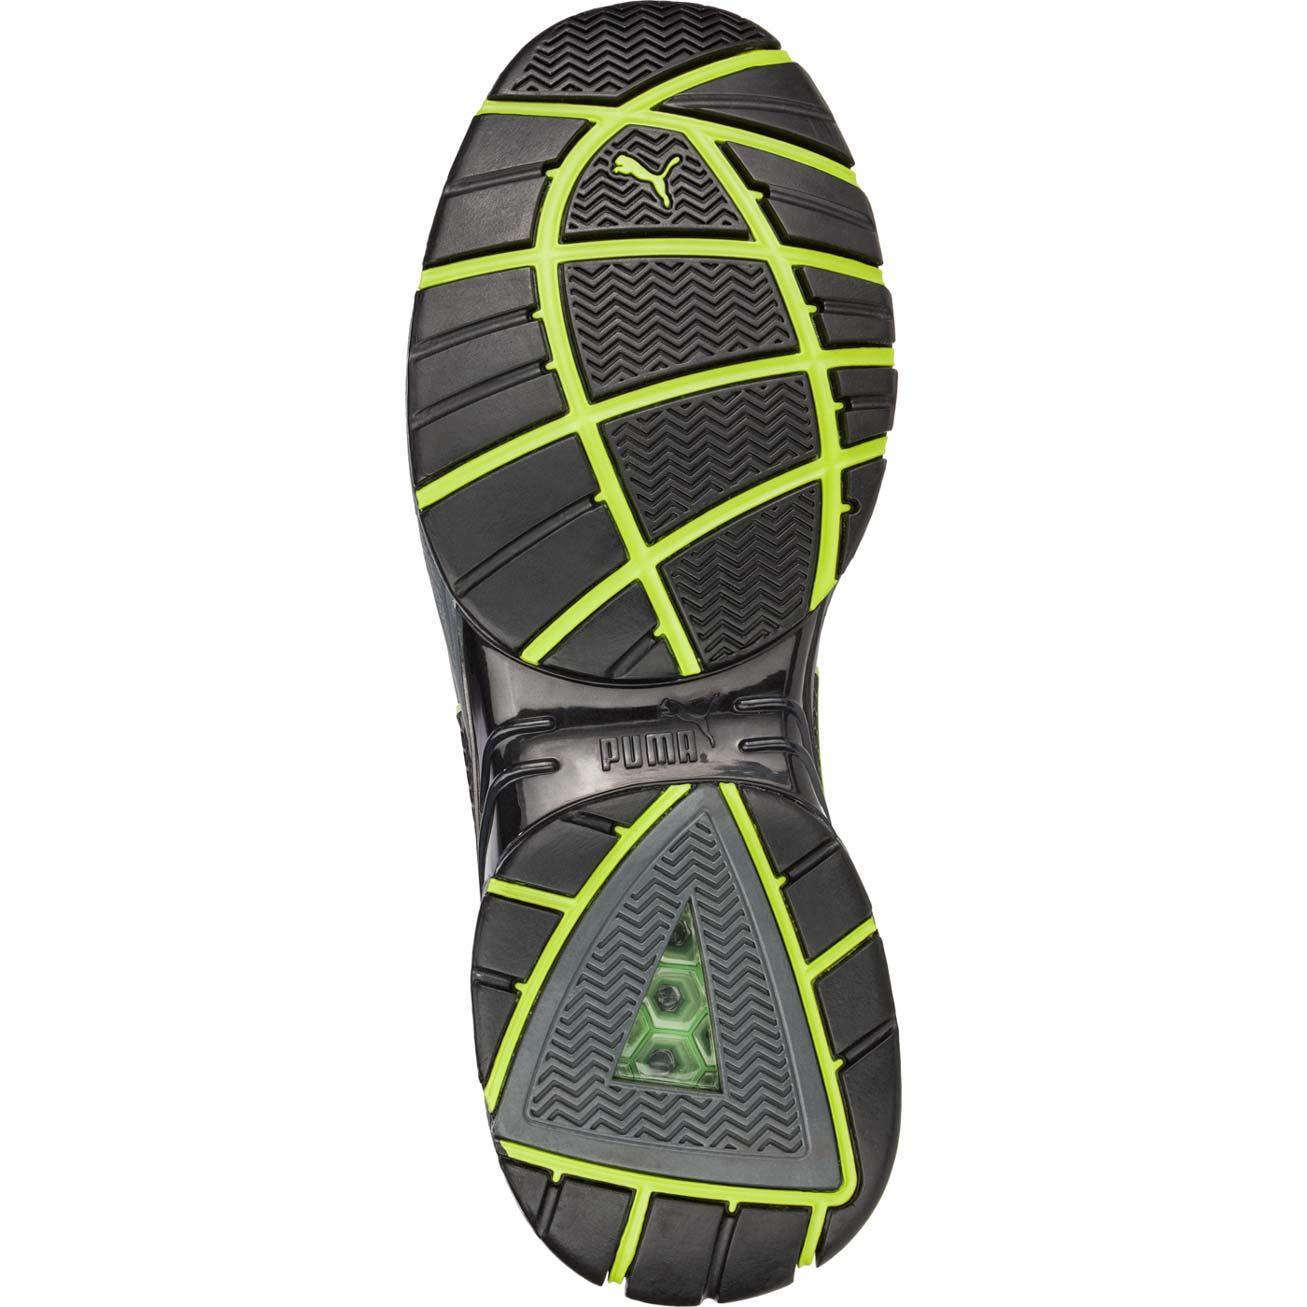 cd890f469ff77b Images. Puma Fuse Motion Green Composite Toe Static-Dissipative Shoe ...